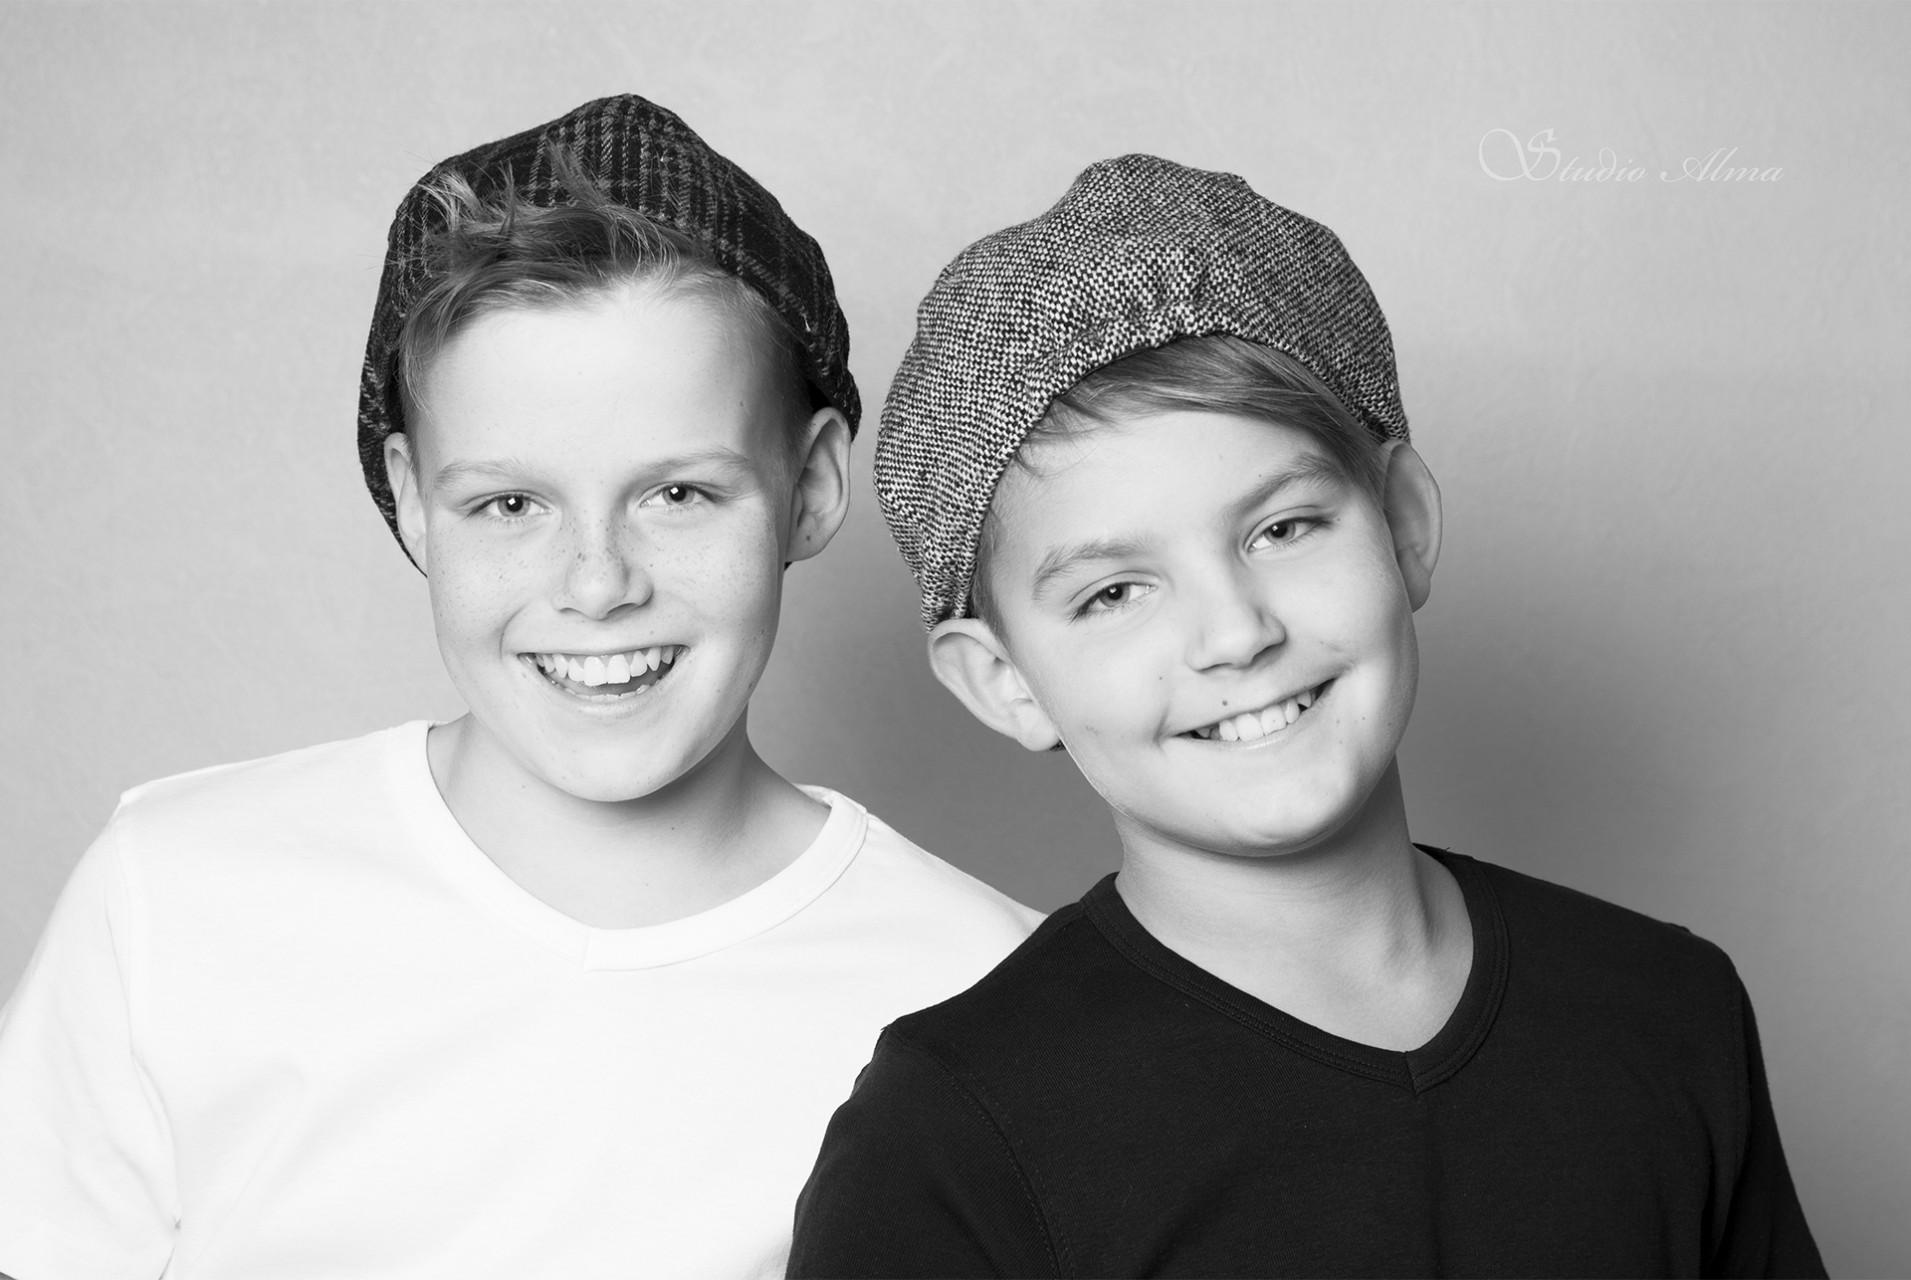 twins-studioalma-sh